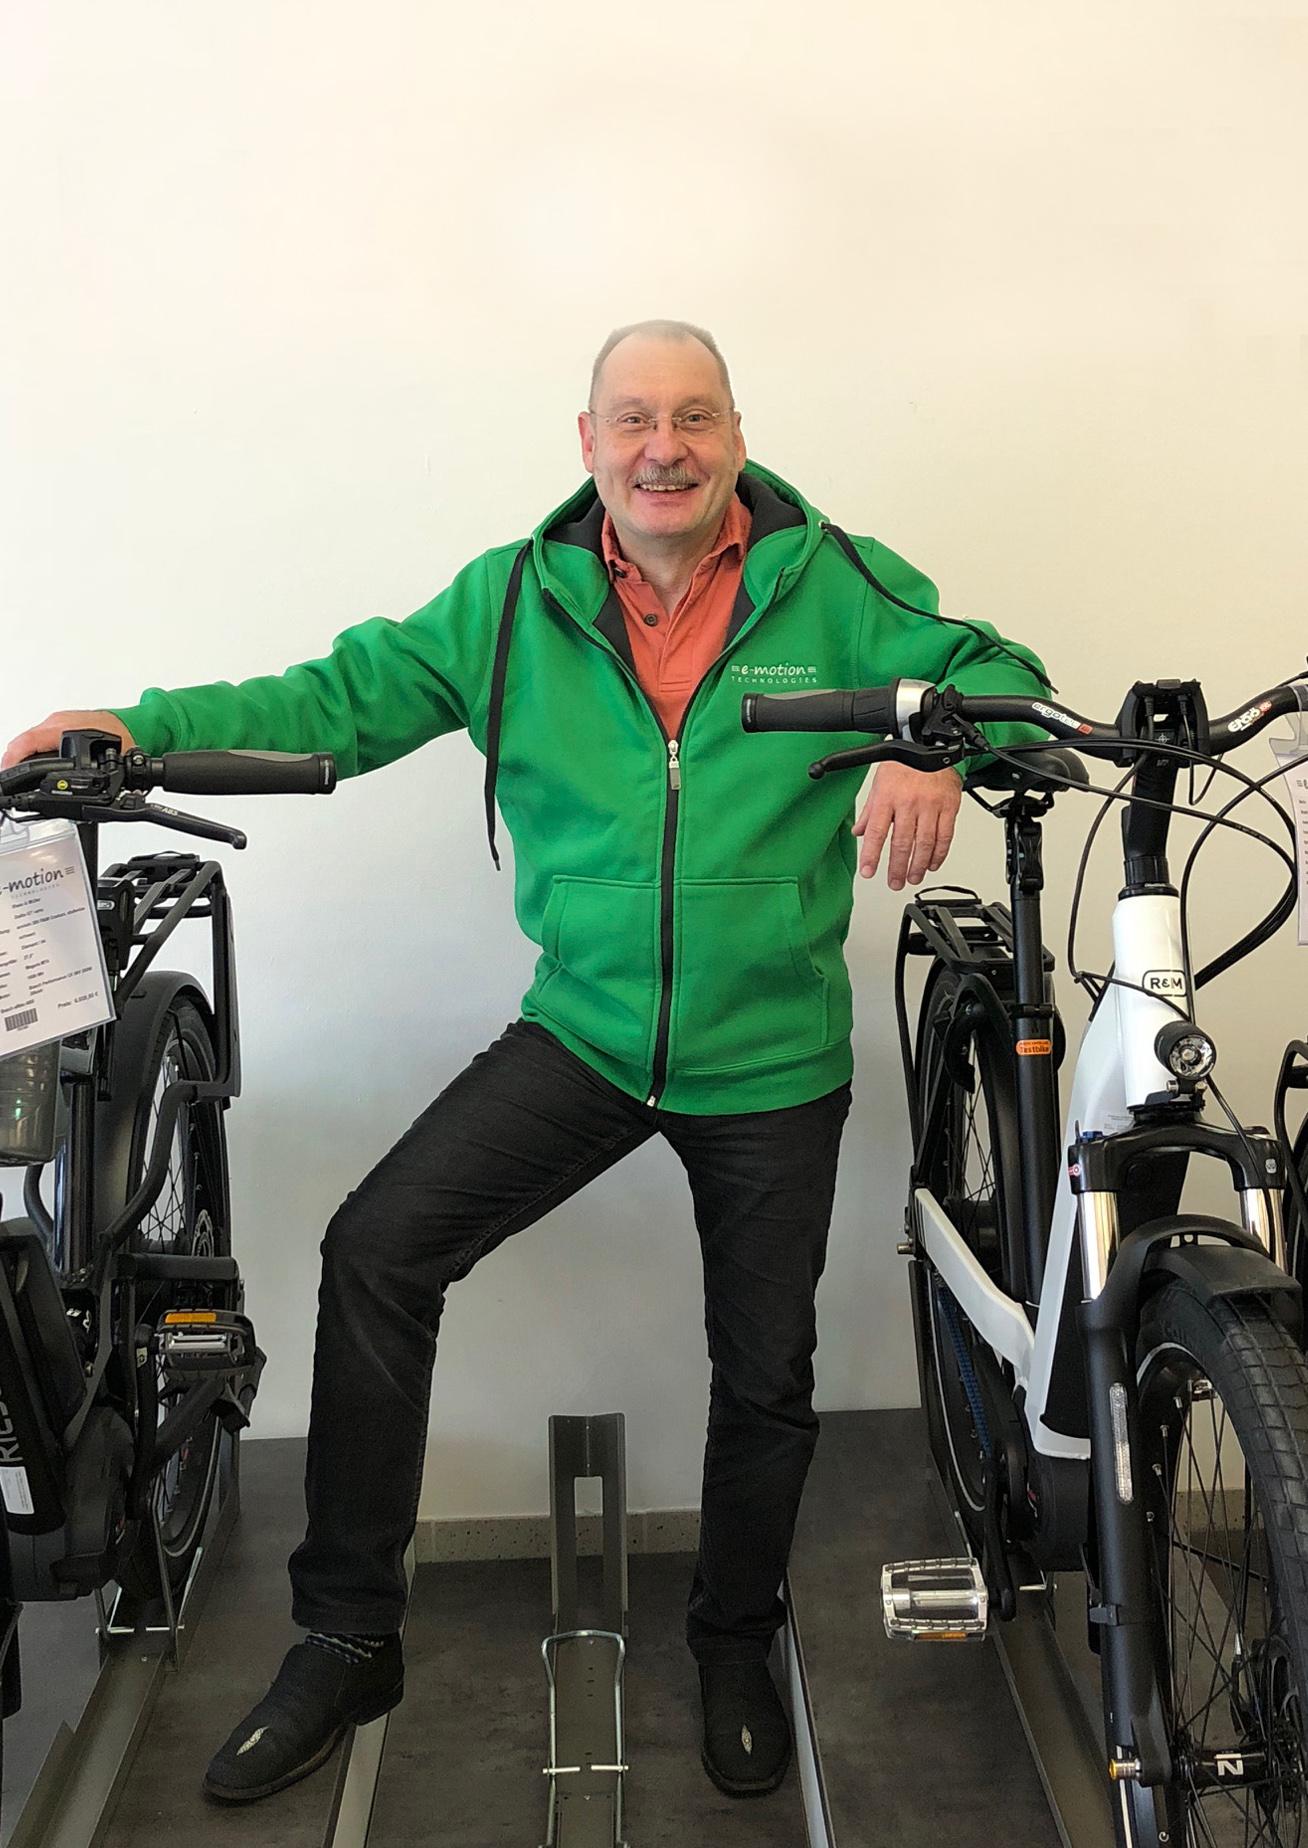 e-motion e-Bike Experte Christoph Daim in Wien - Österreich